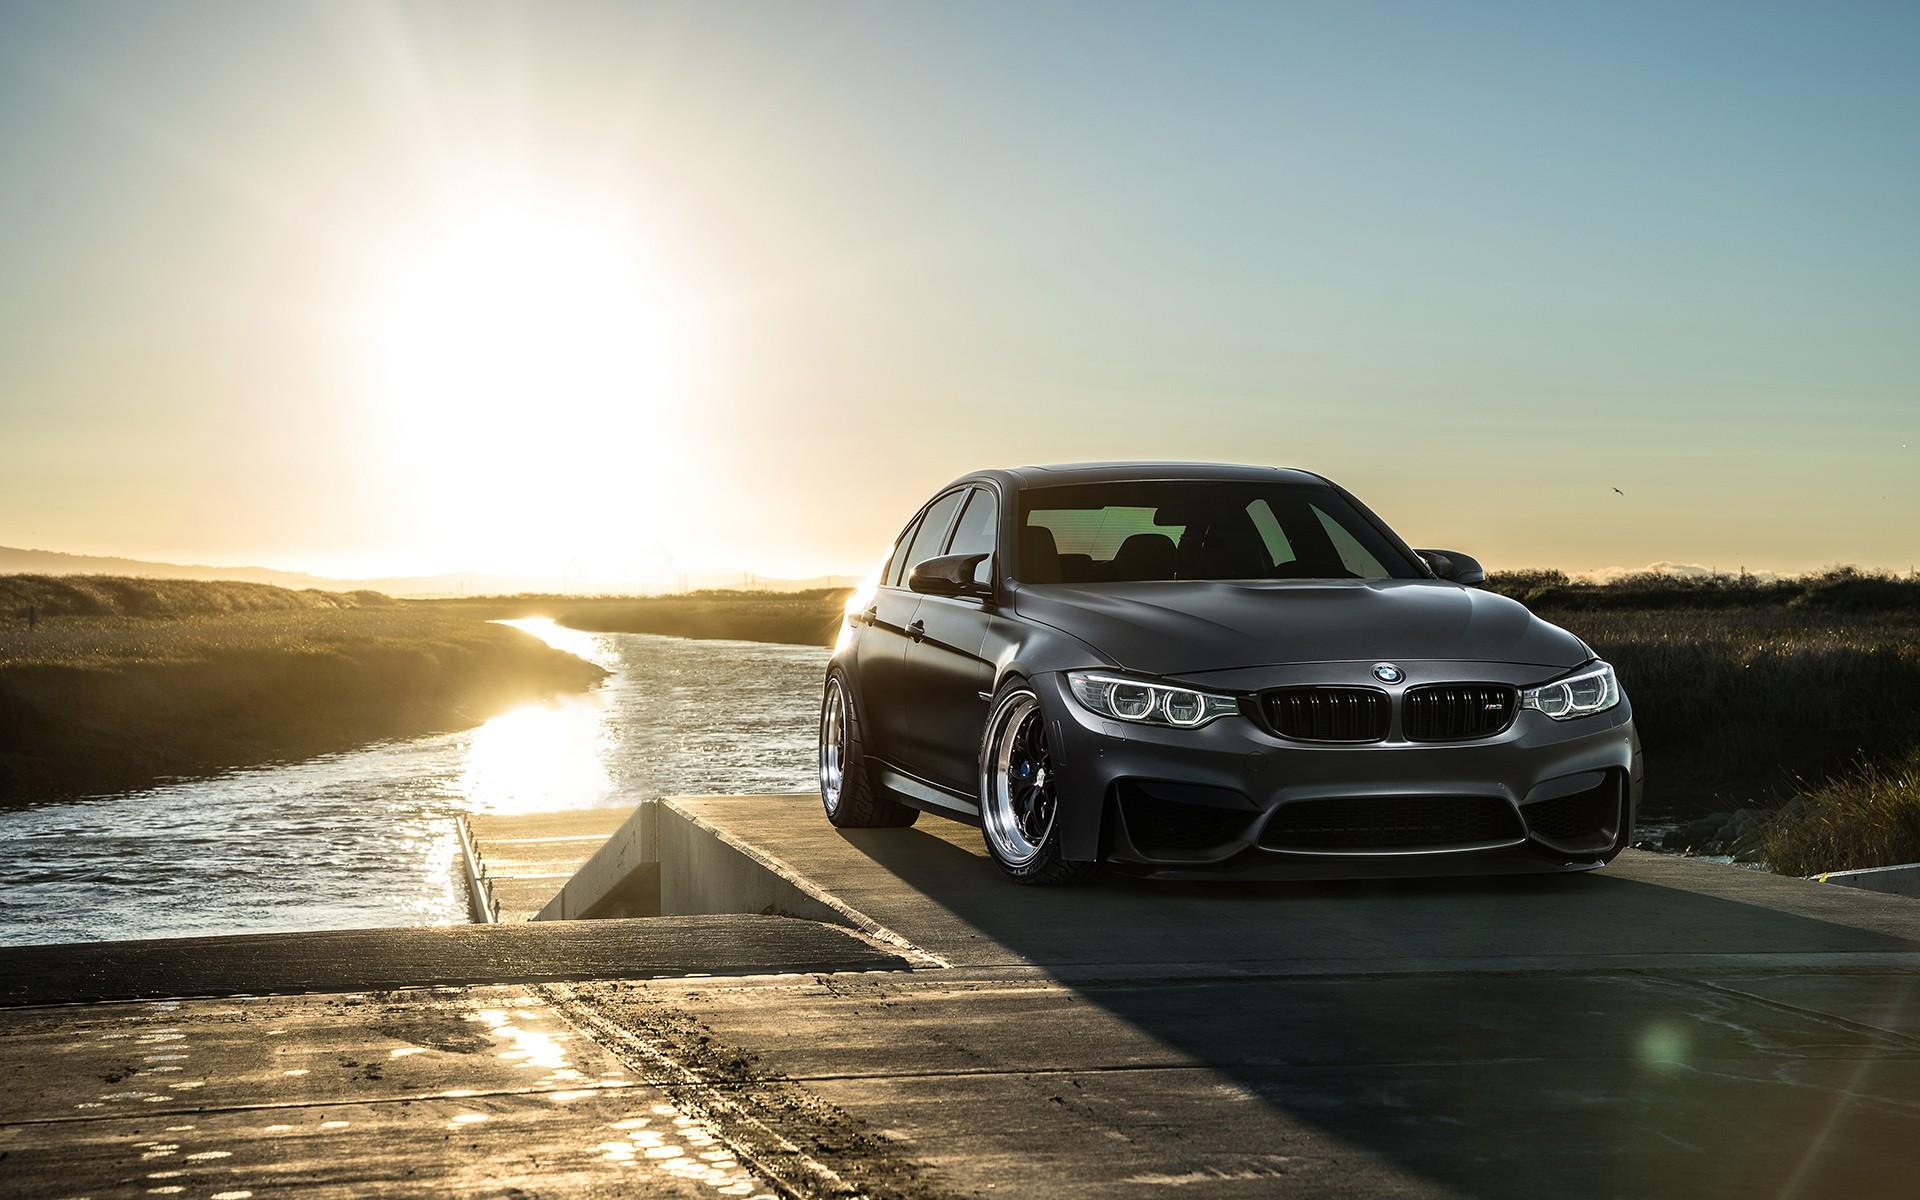 BMW F80 M3 Mode Carbon Wallpaper | HD Car Wallpapers | ID ...